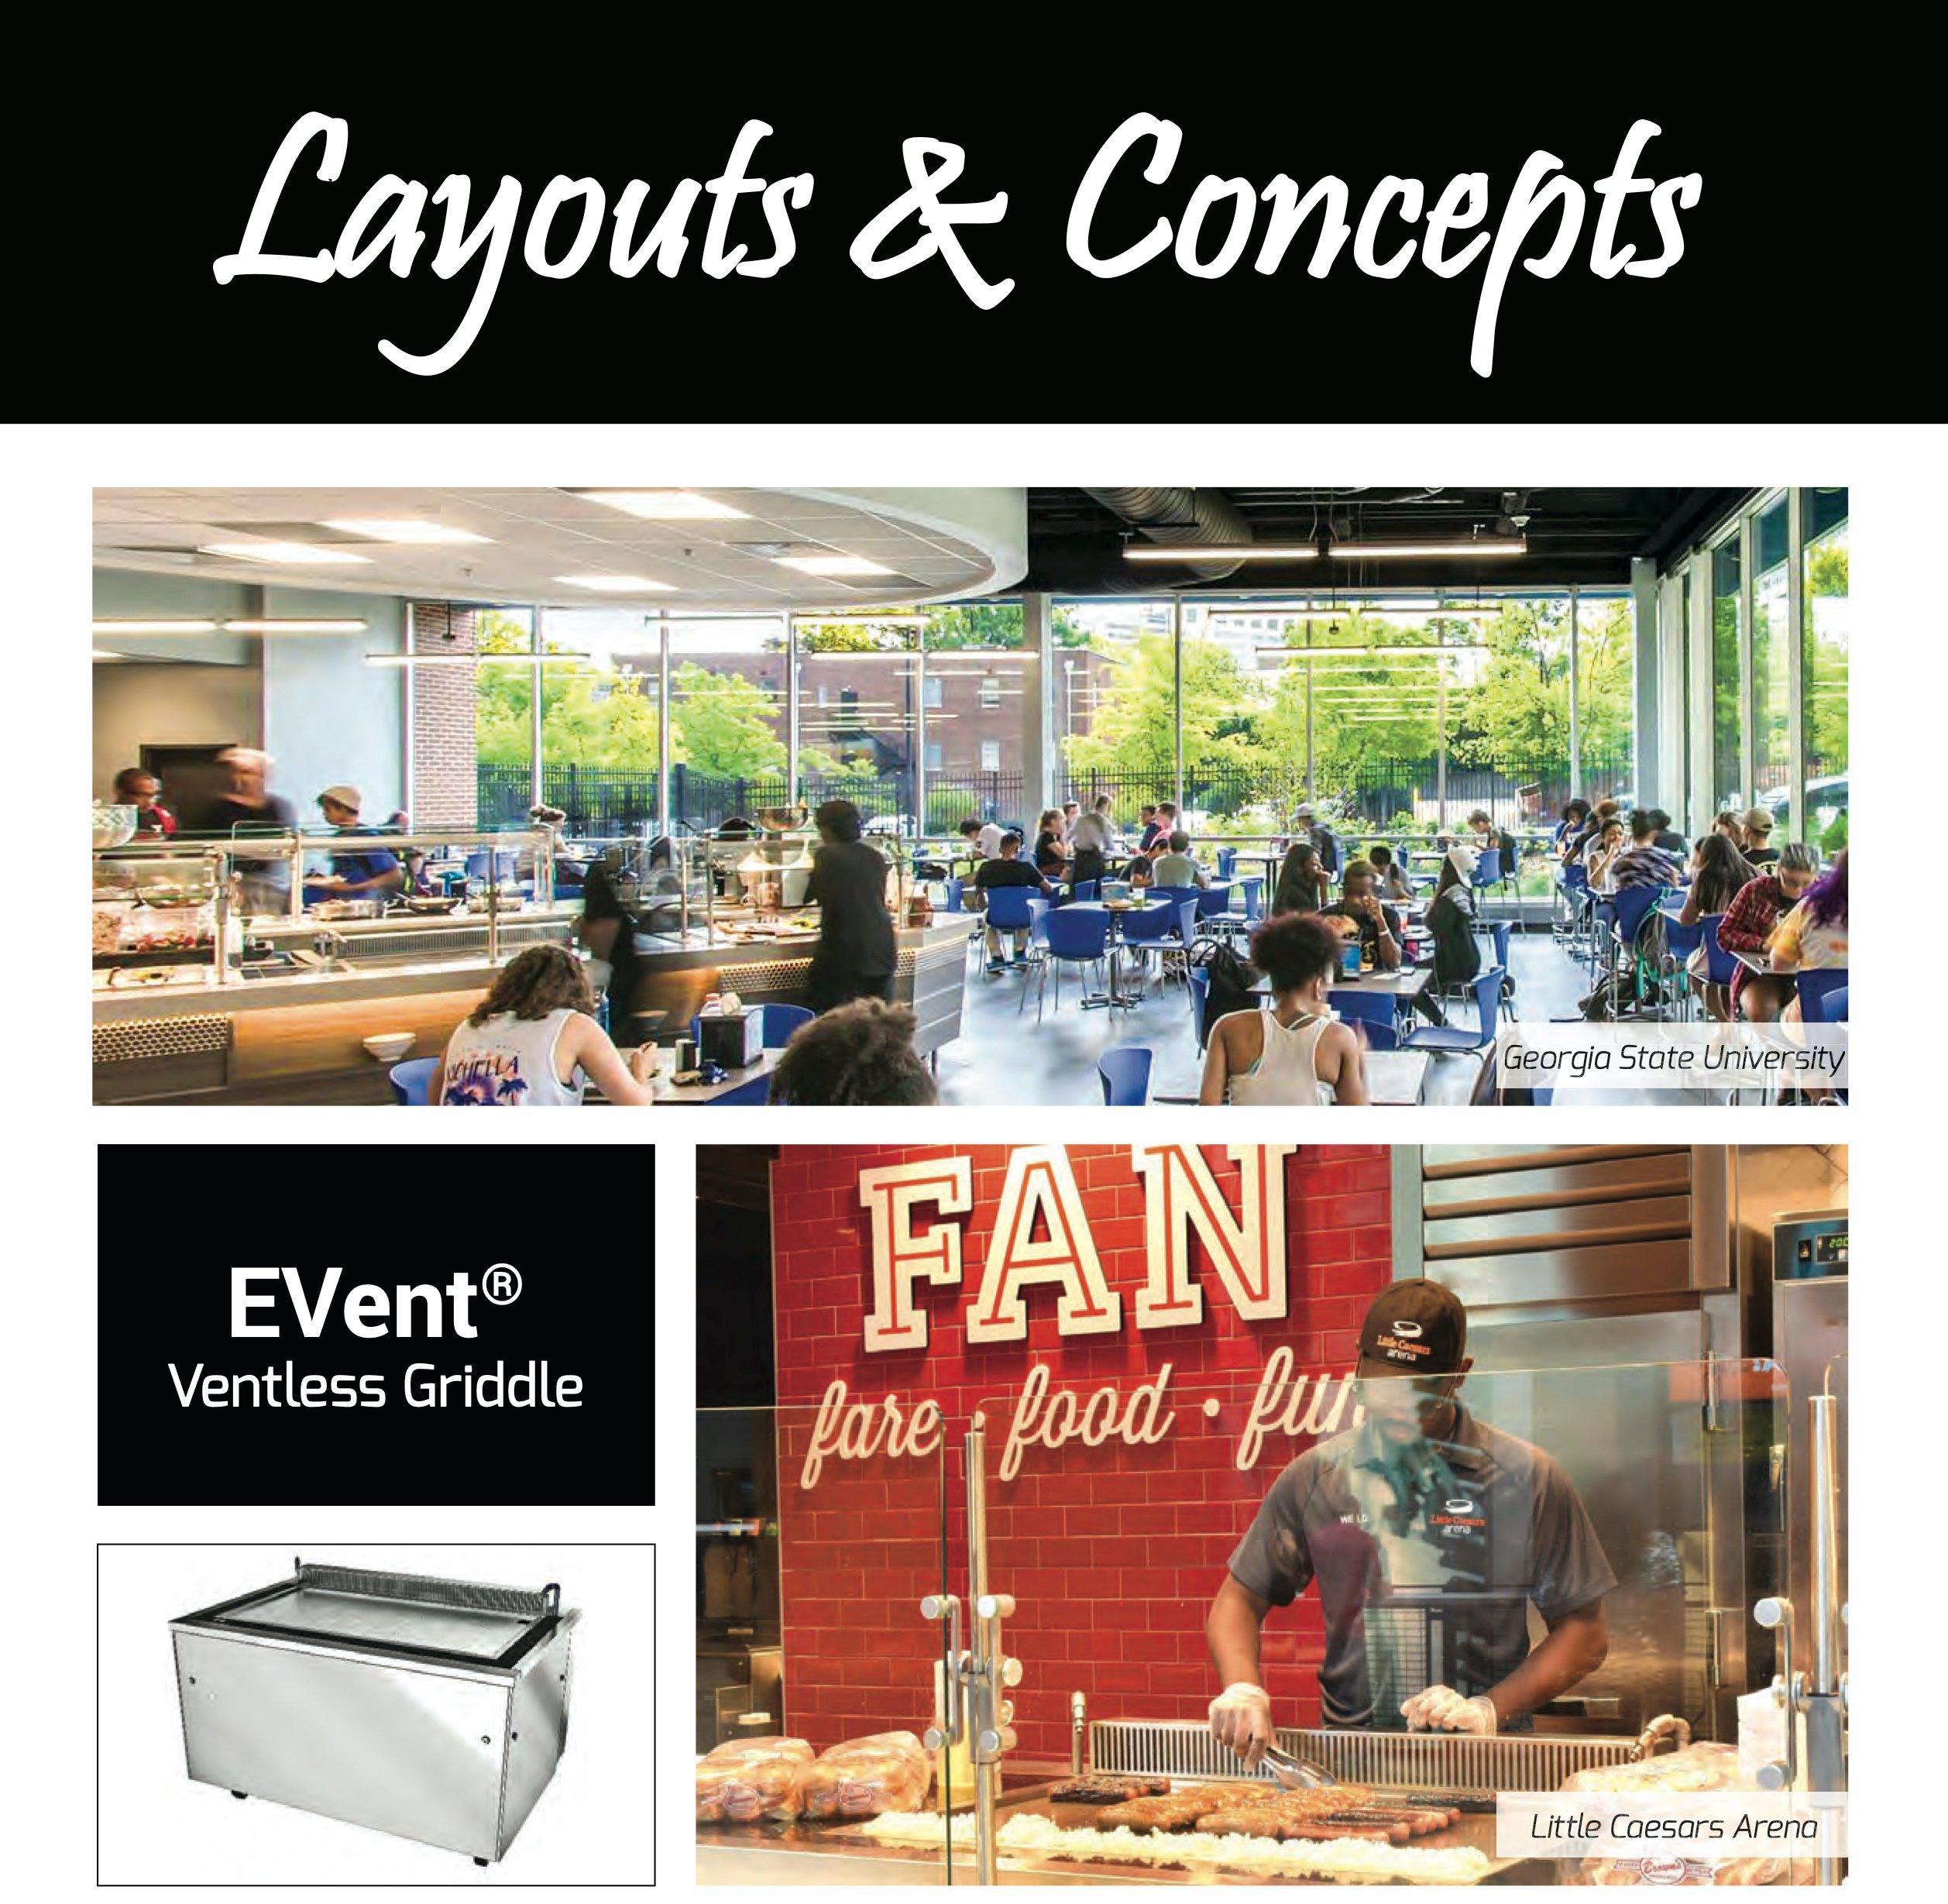 Evo-EVent-Layout-and-Concept-Foodservice-Portfoliosm